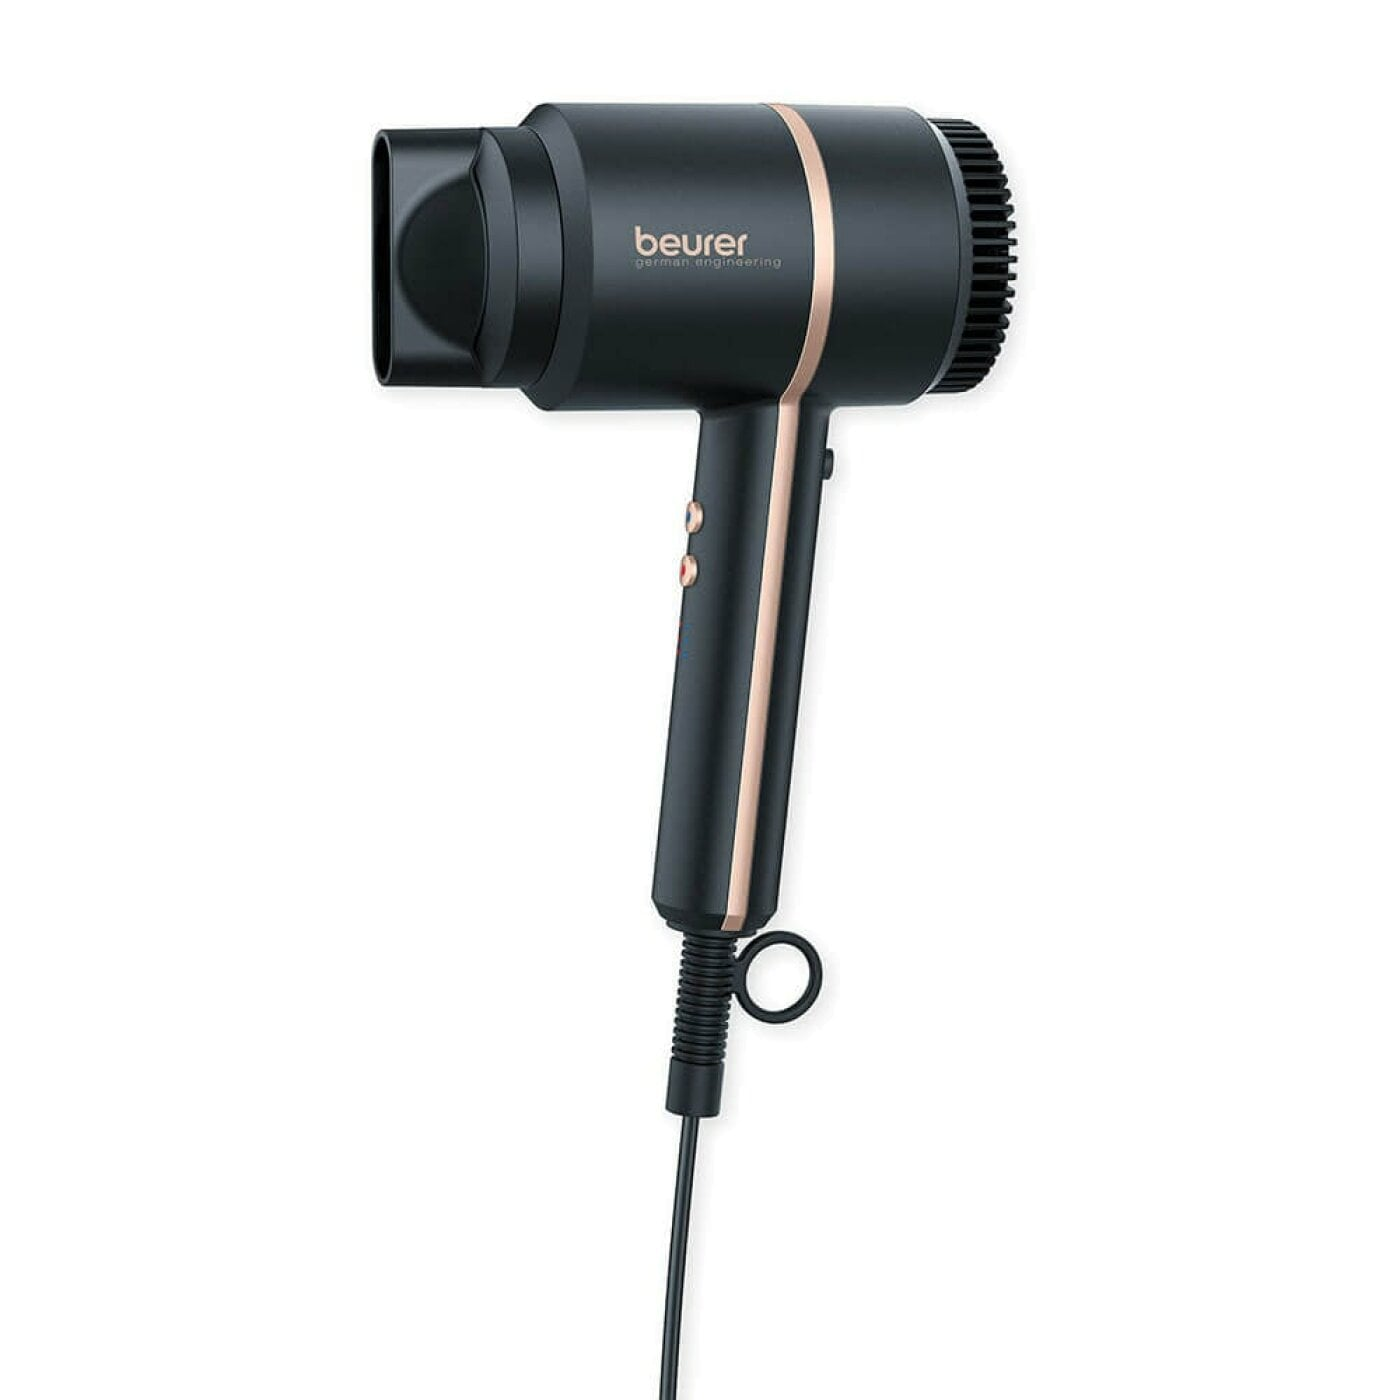 Beurer - HC 35 compact hairdryer - 3 Years Warranty